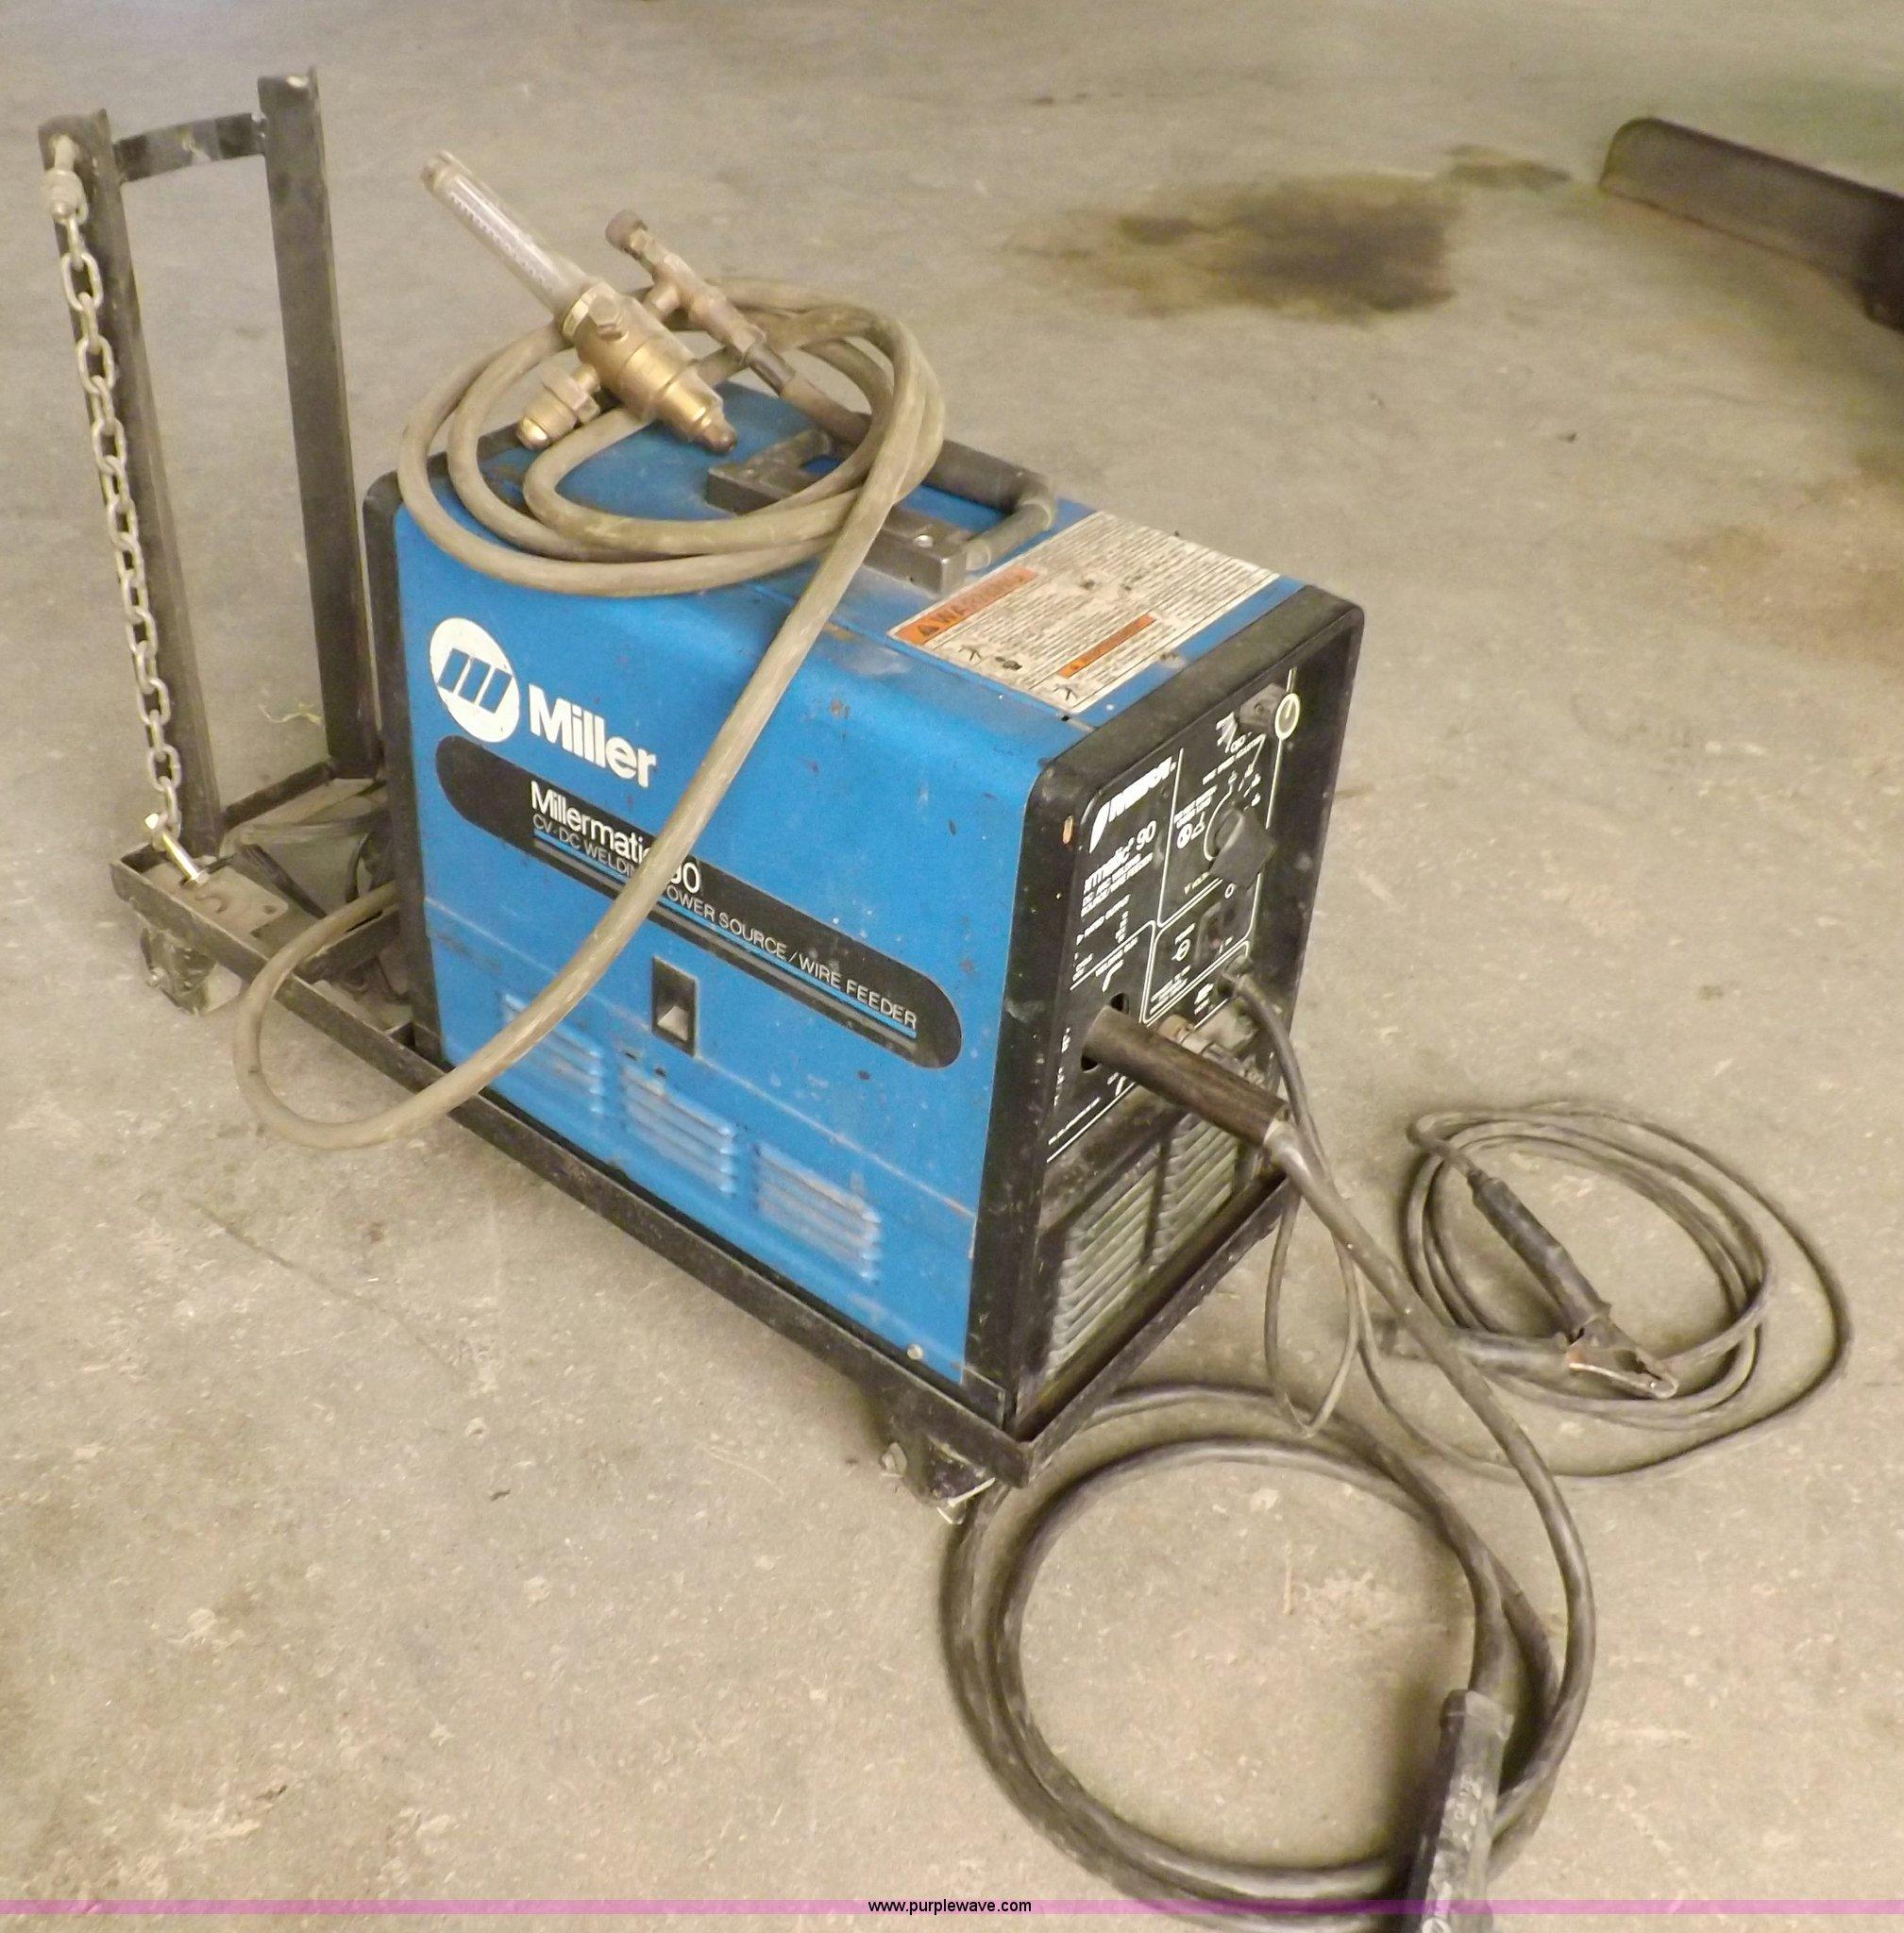 Miller Millermatic 90 CV-DC arc welding power source | Item ...